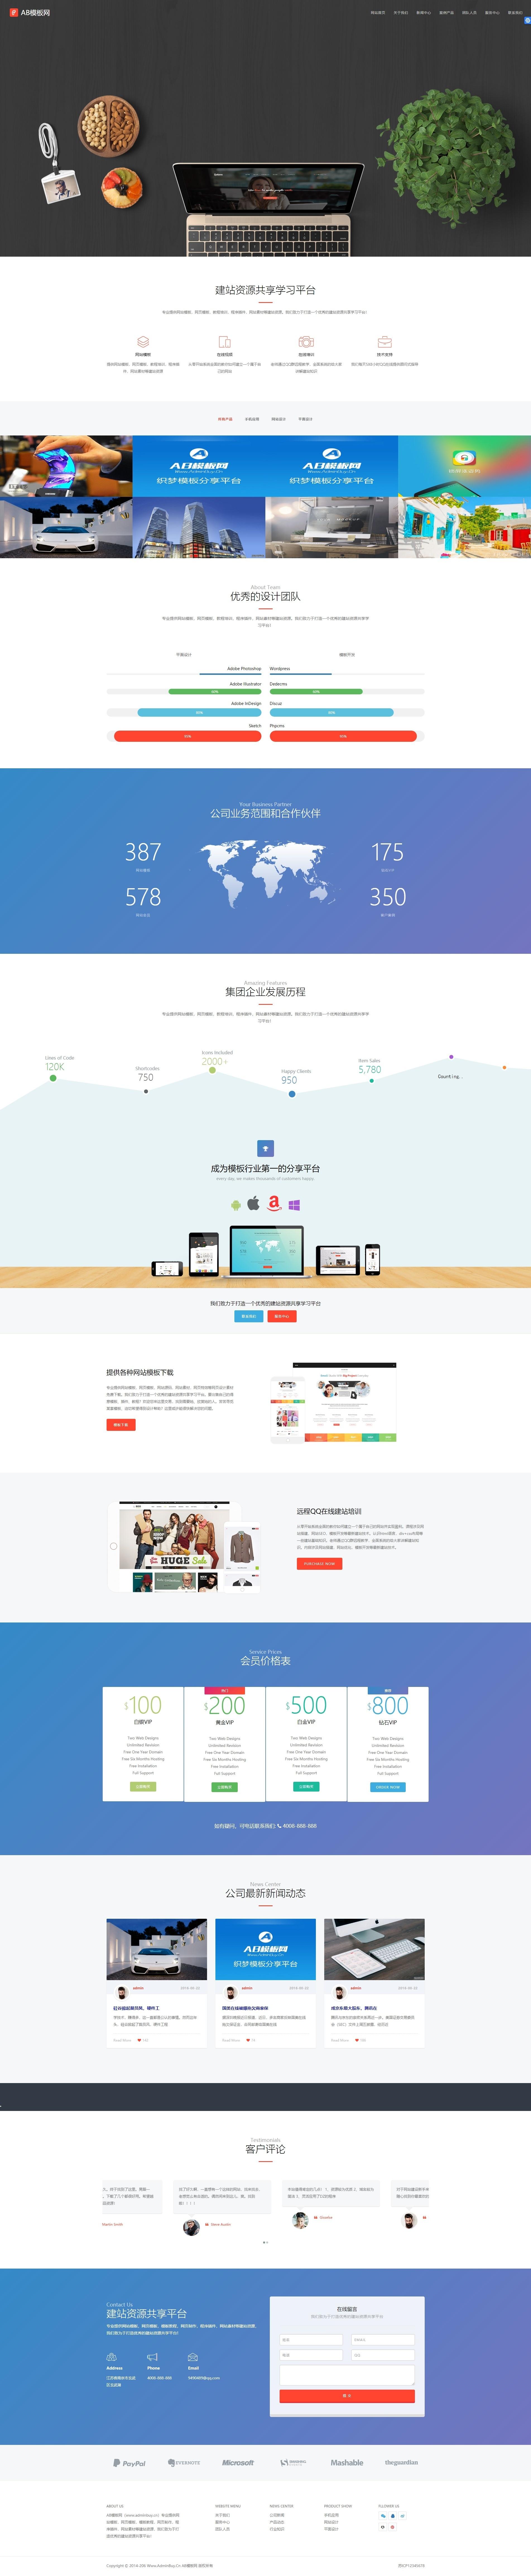 dedecms织梦模板黑白网站建设企业网站模板[自适应手机版]